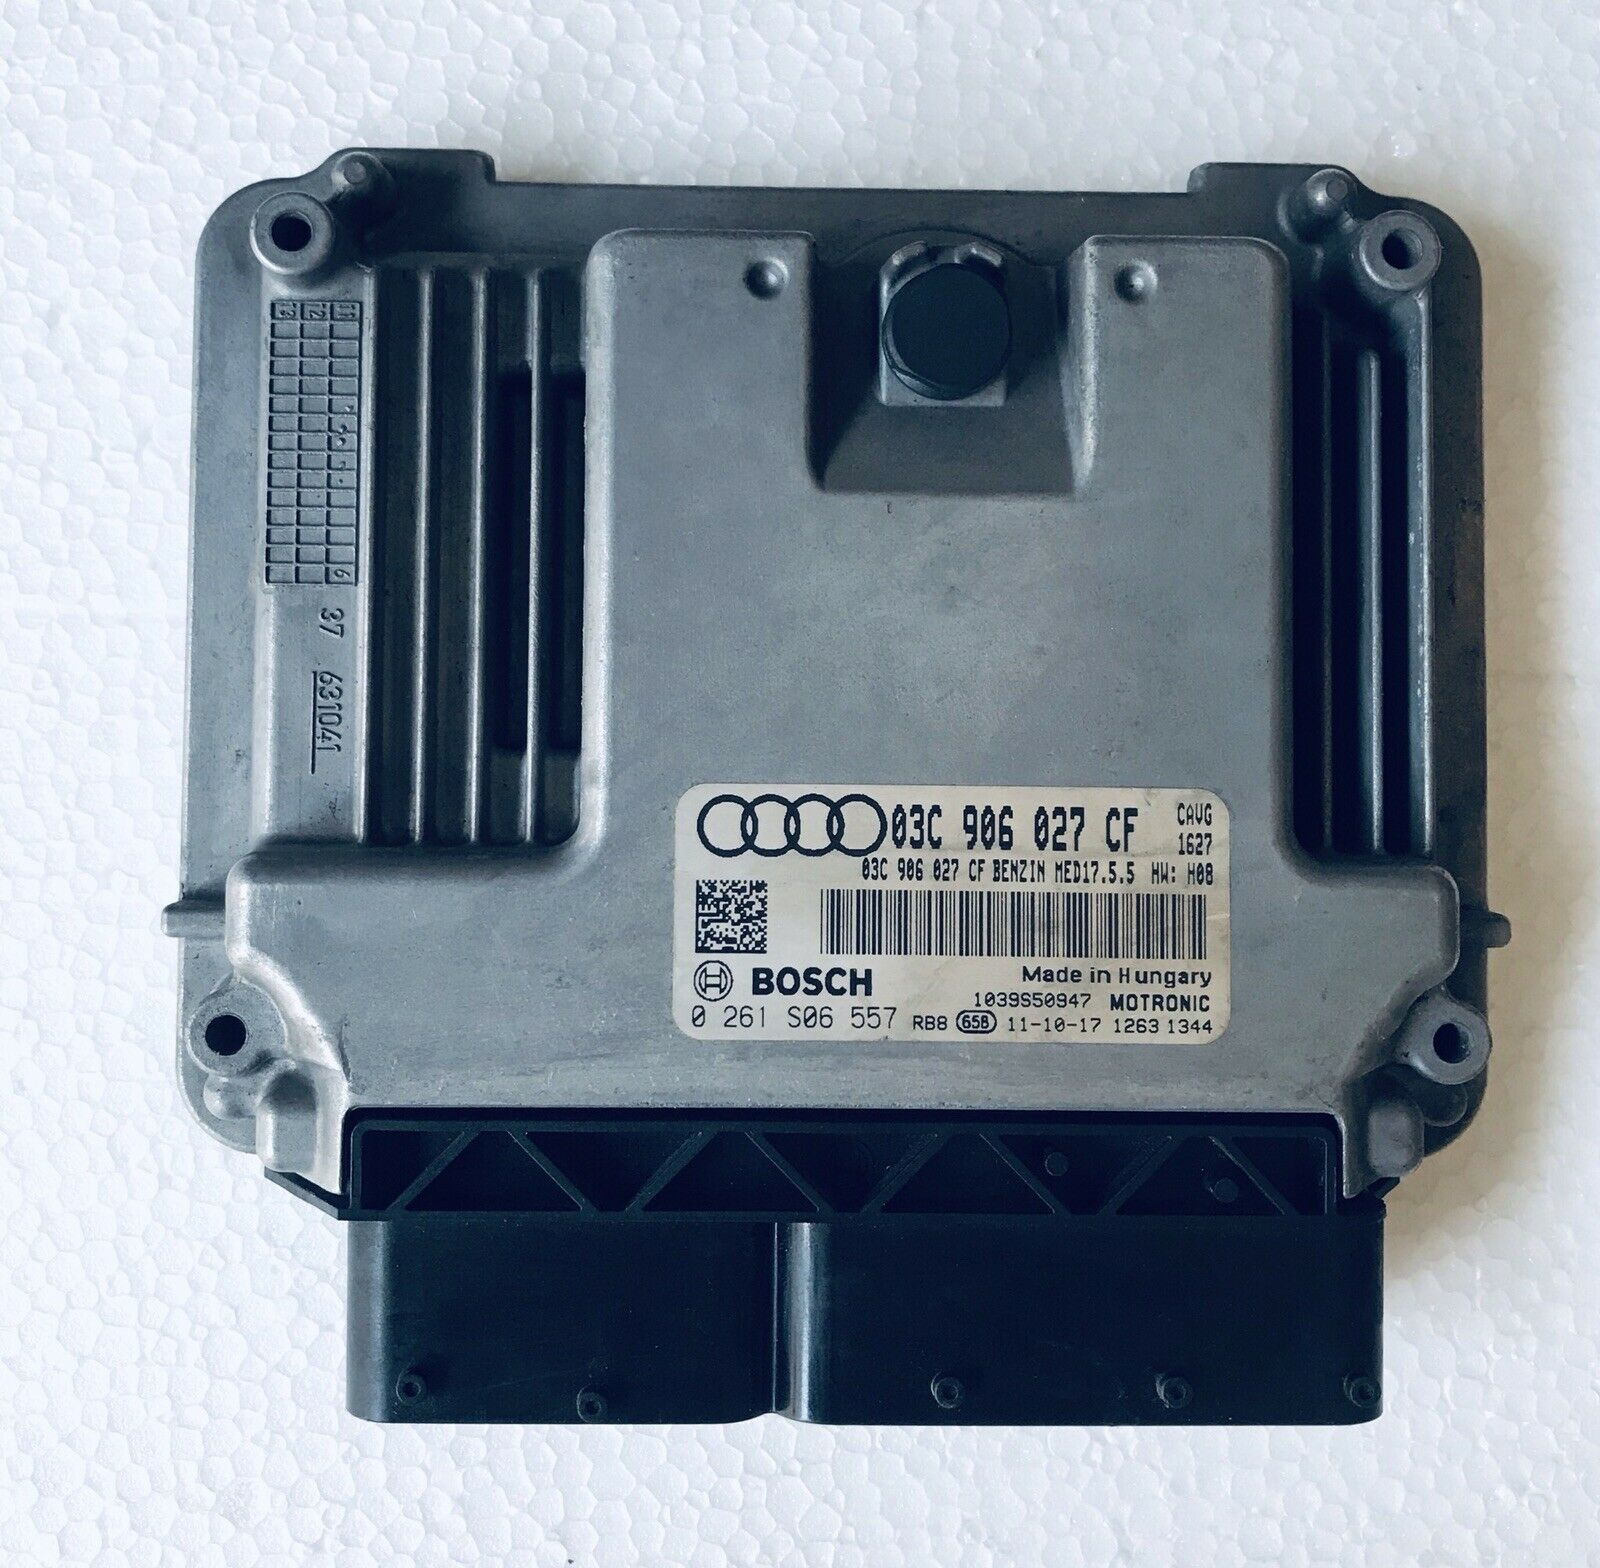 centralina motore Audi A1 1.4 Benzina Codice 03C906027CF Anno 2012 Originale